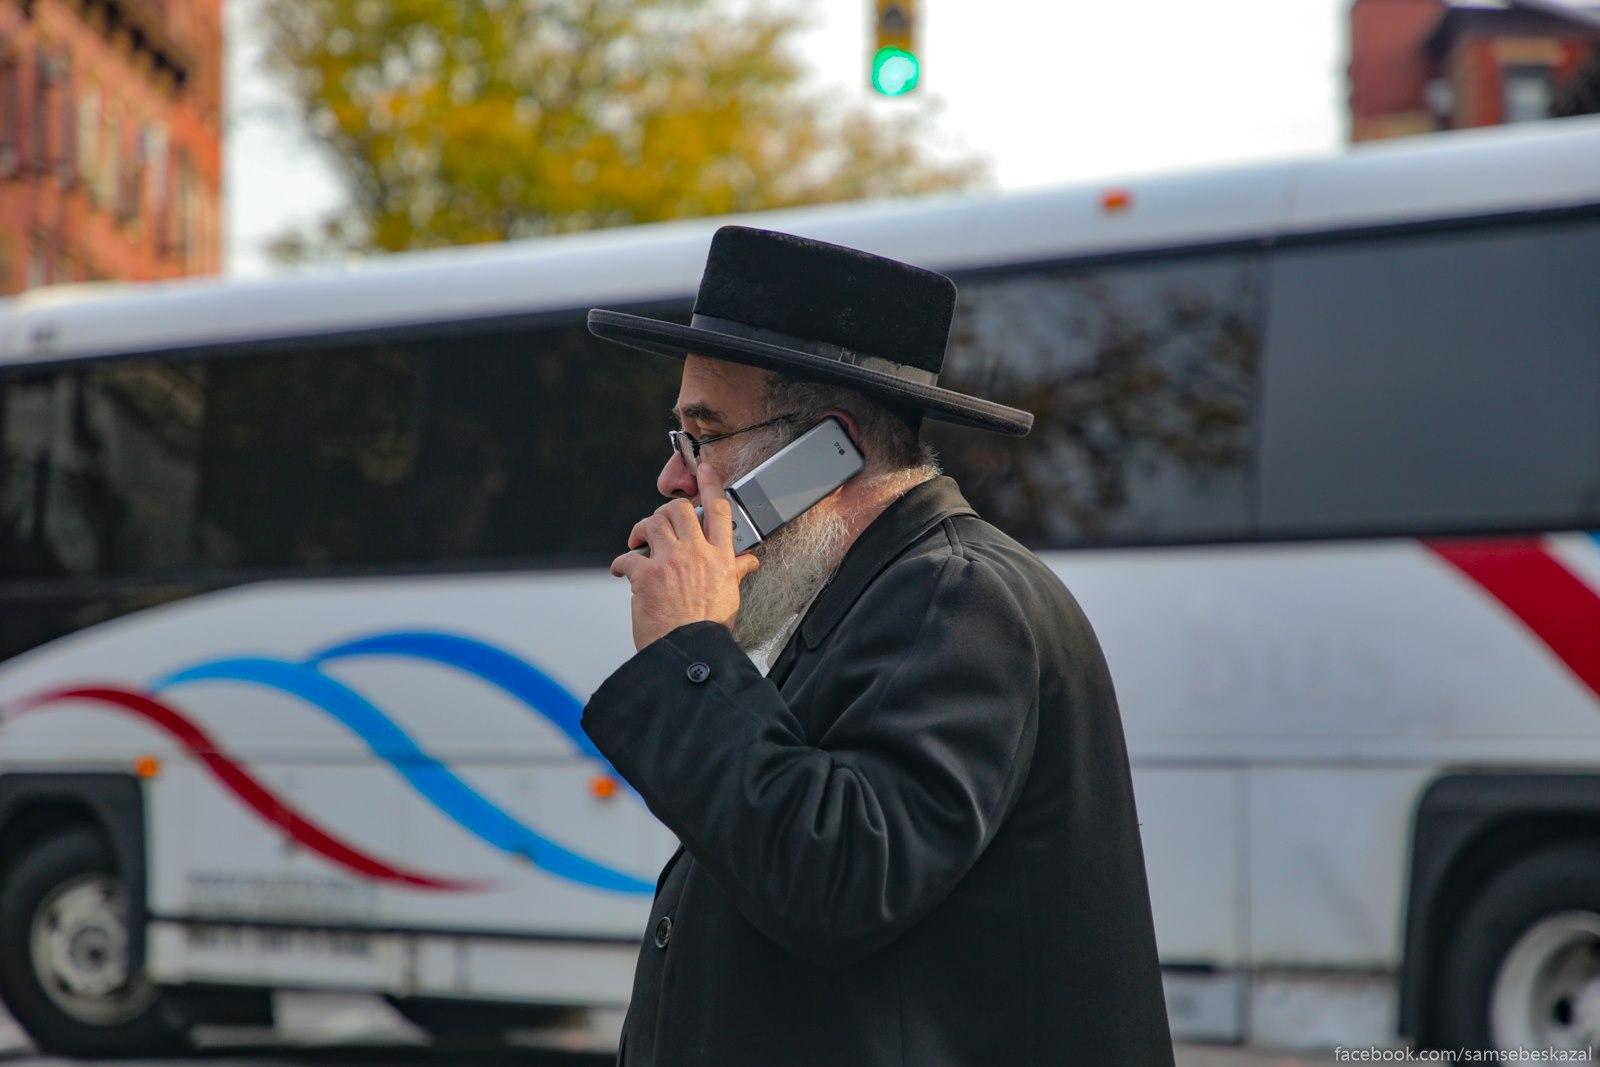 Tehnologii svazi v hasidskom Uilʹamsburge. Oni vse tam s takimi telefonami hodat.